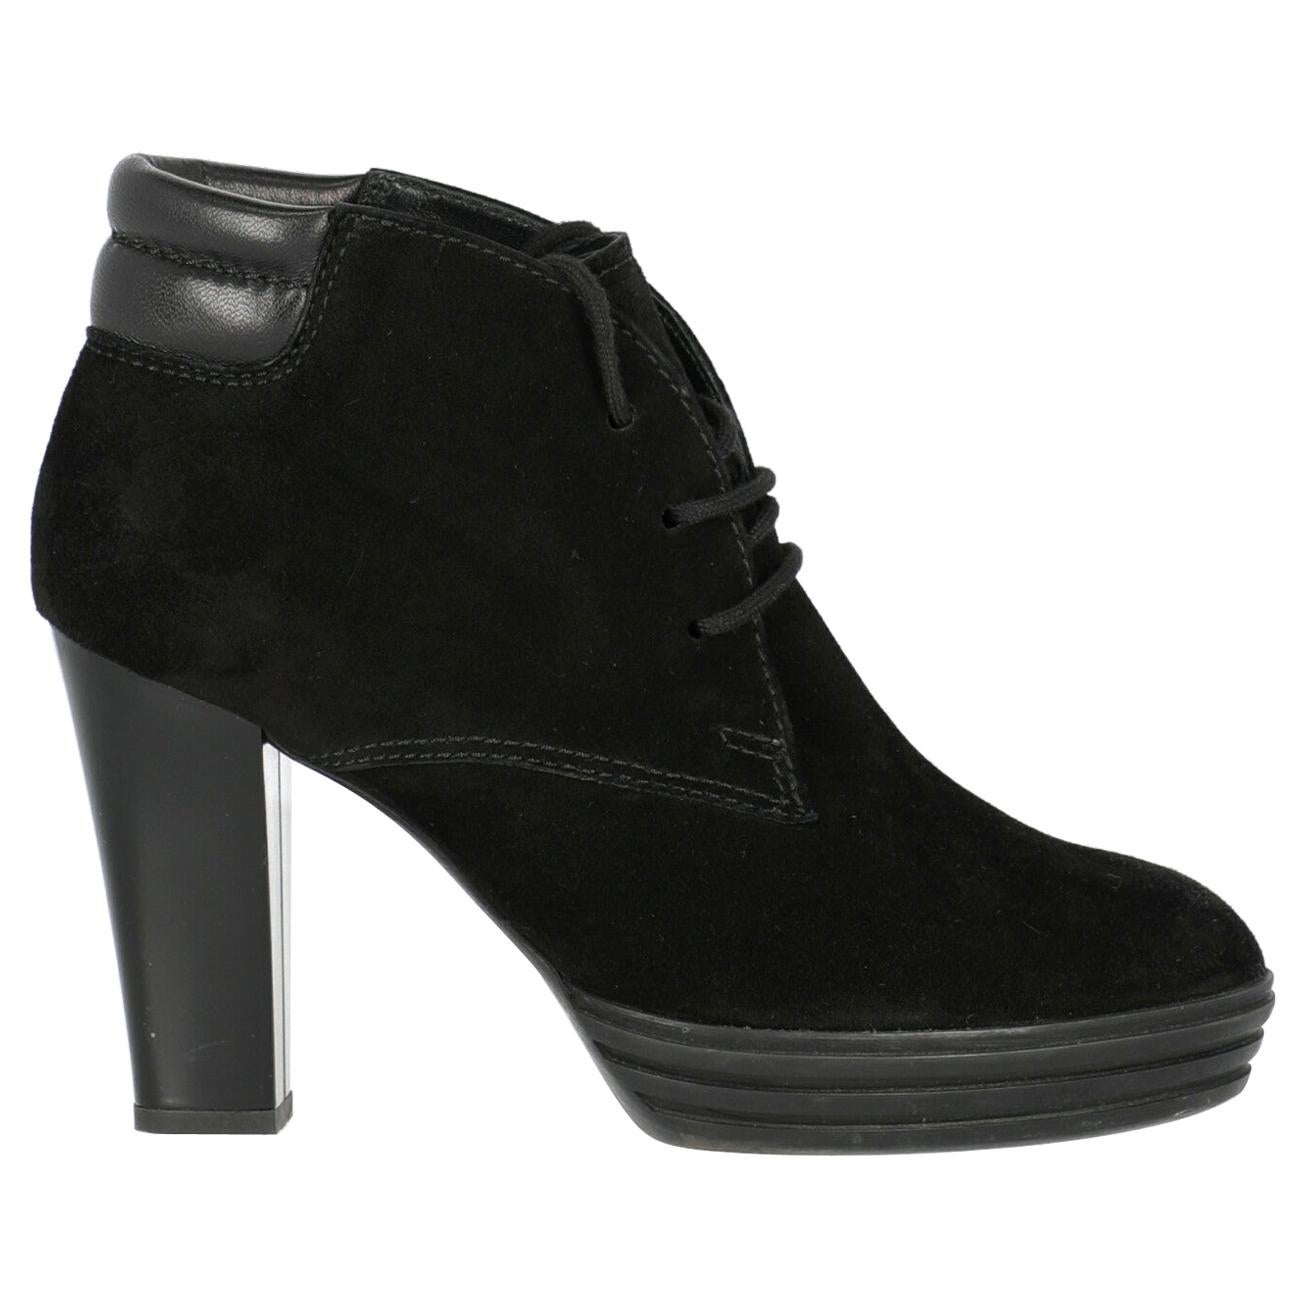 Hogan Woman Ankle boots Black EU 36